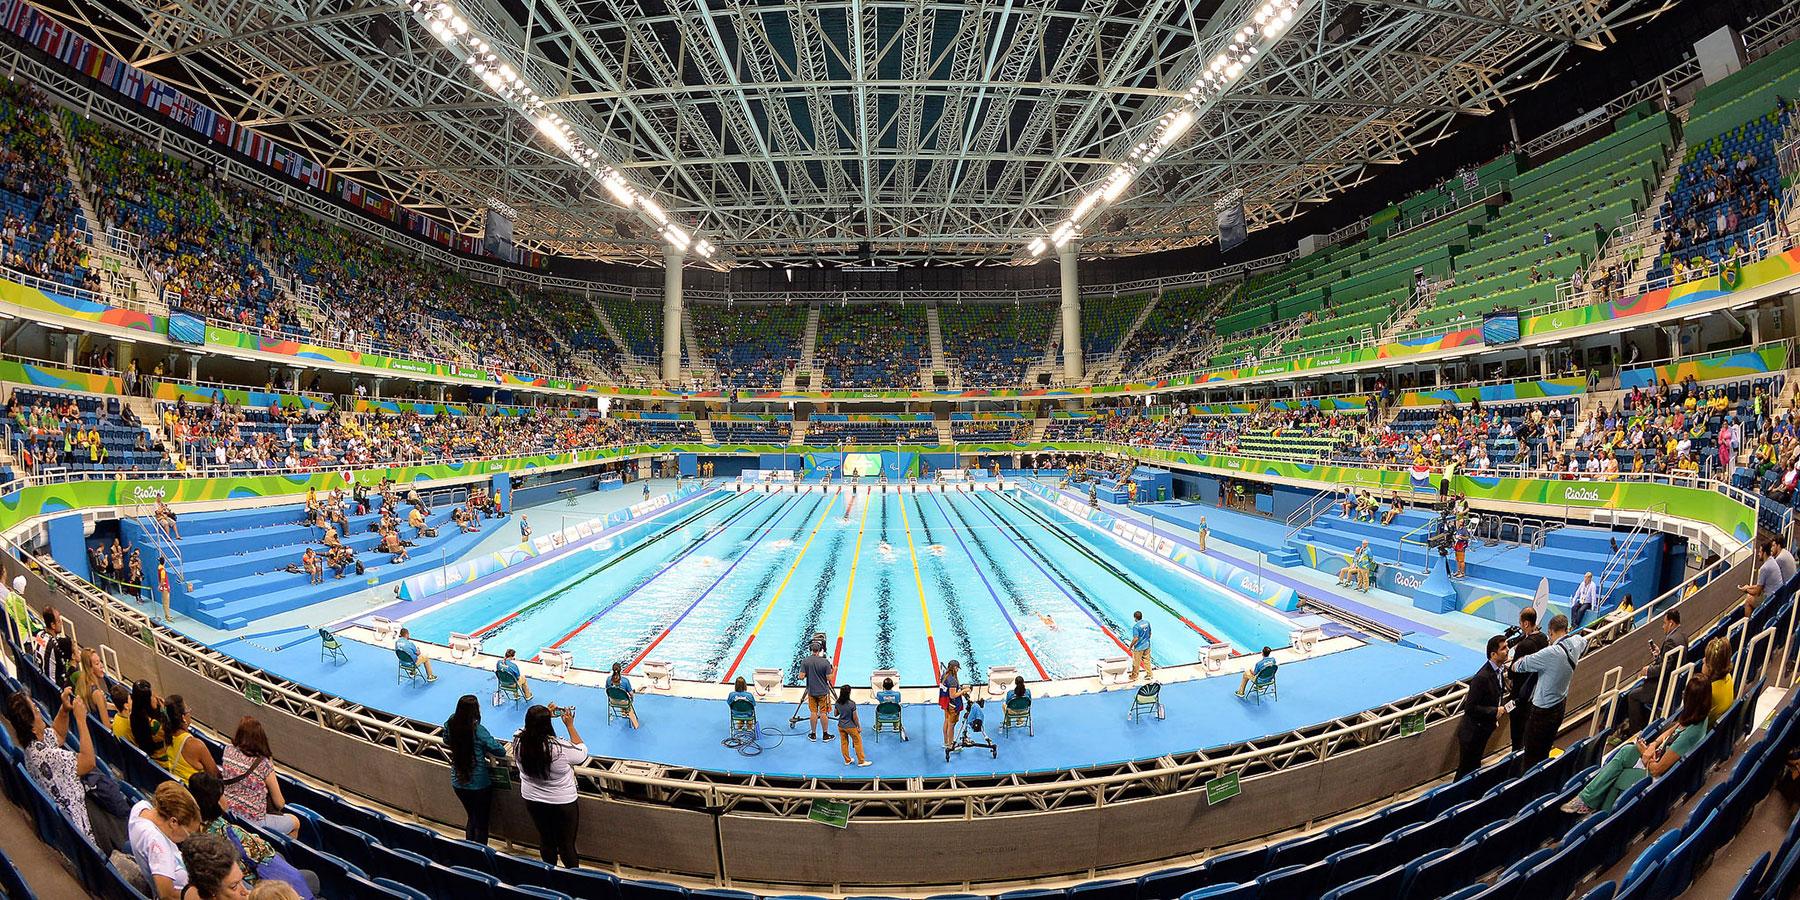 Aquatic center, Rio 2016